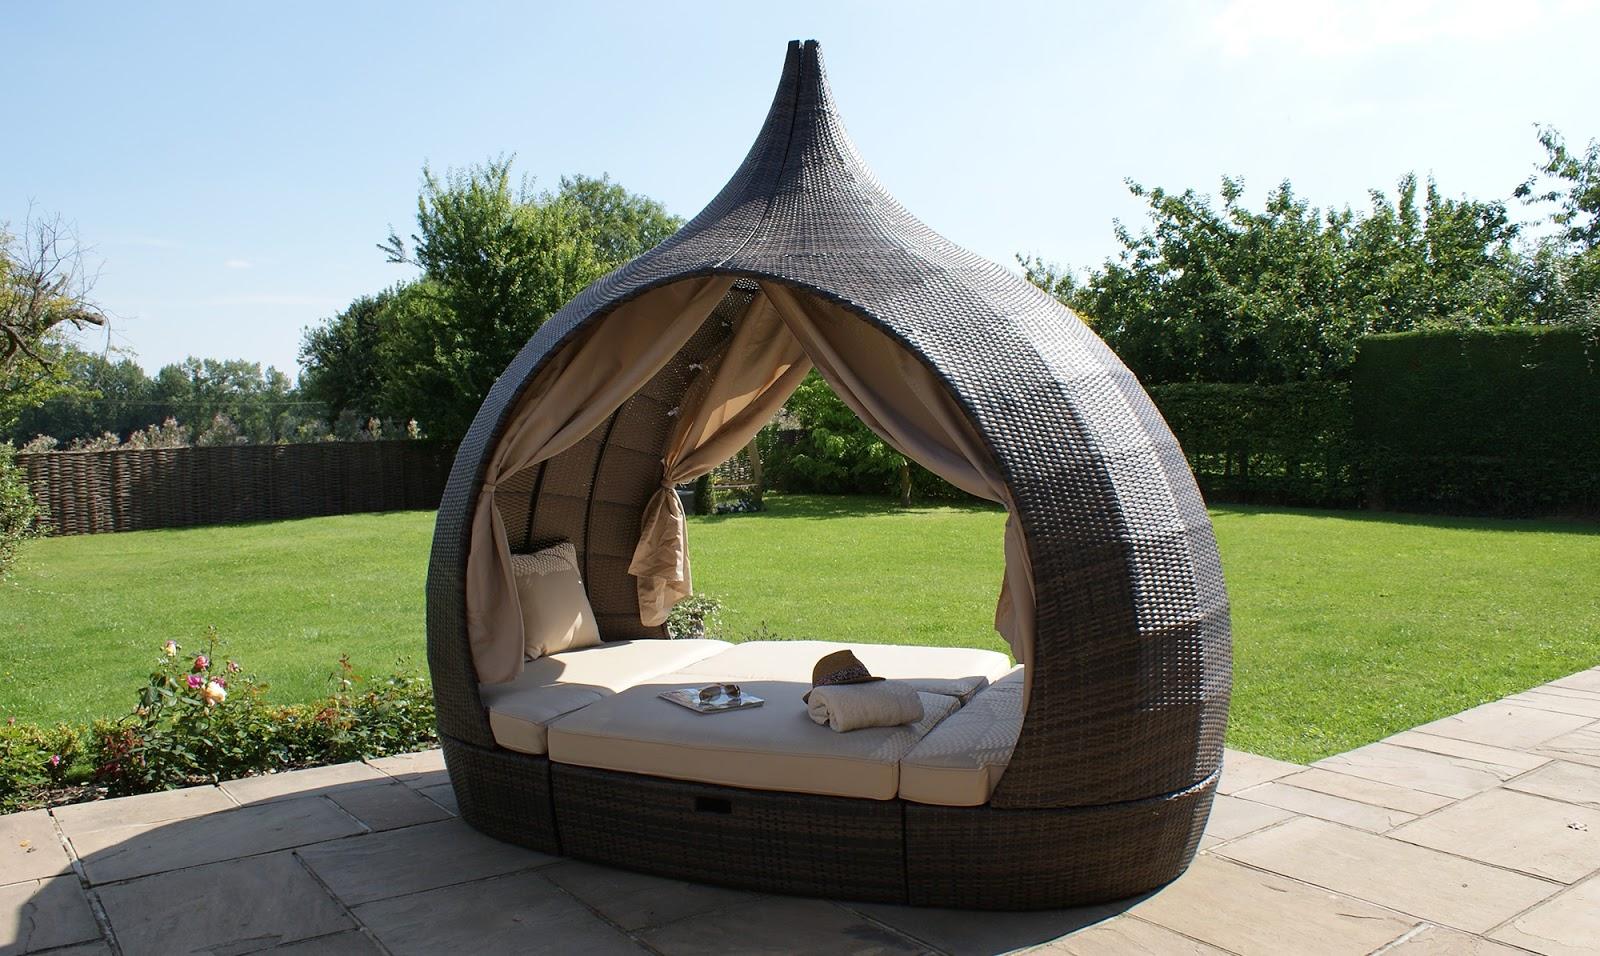 Homebase Garden Daybed : Spring garden decor wishlist a life with frills